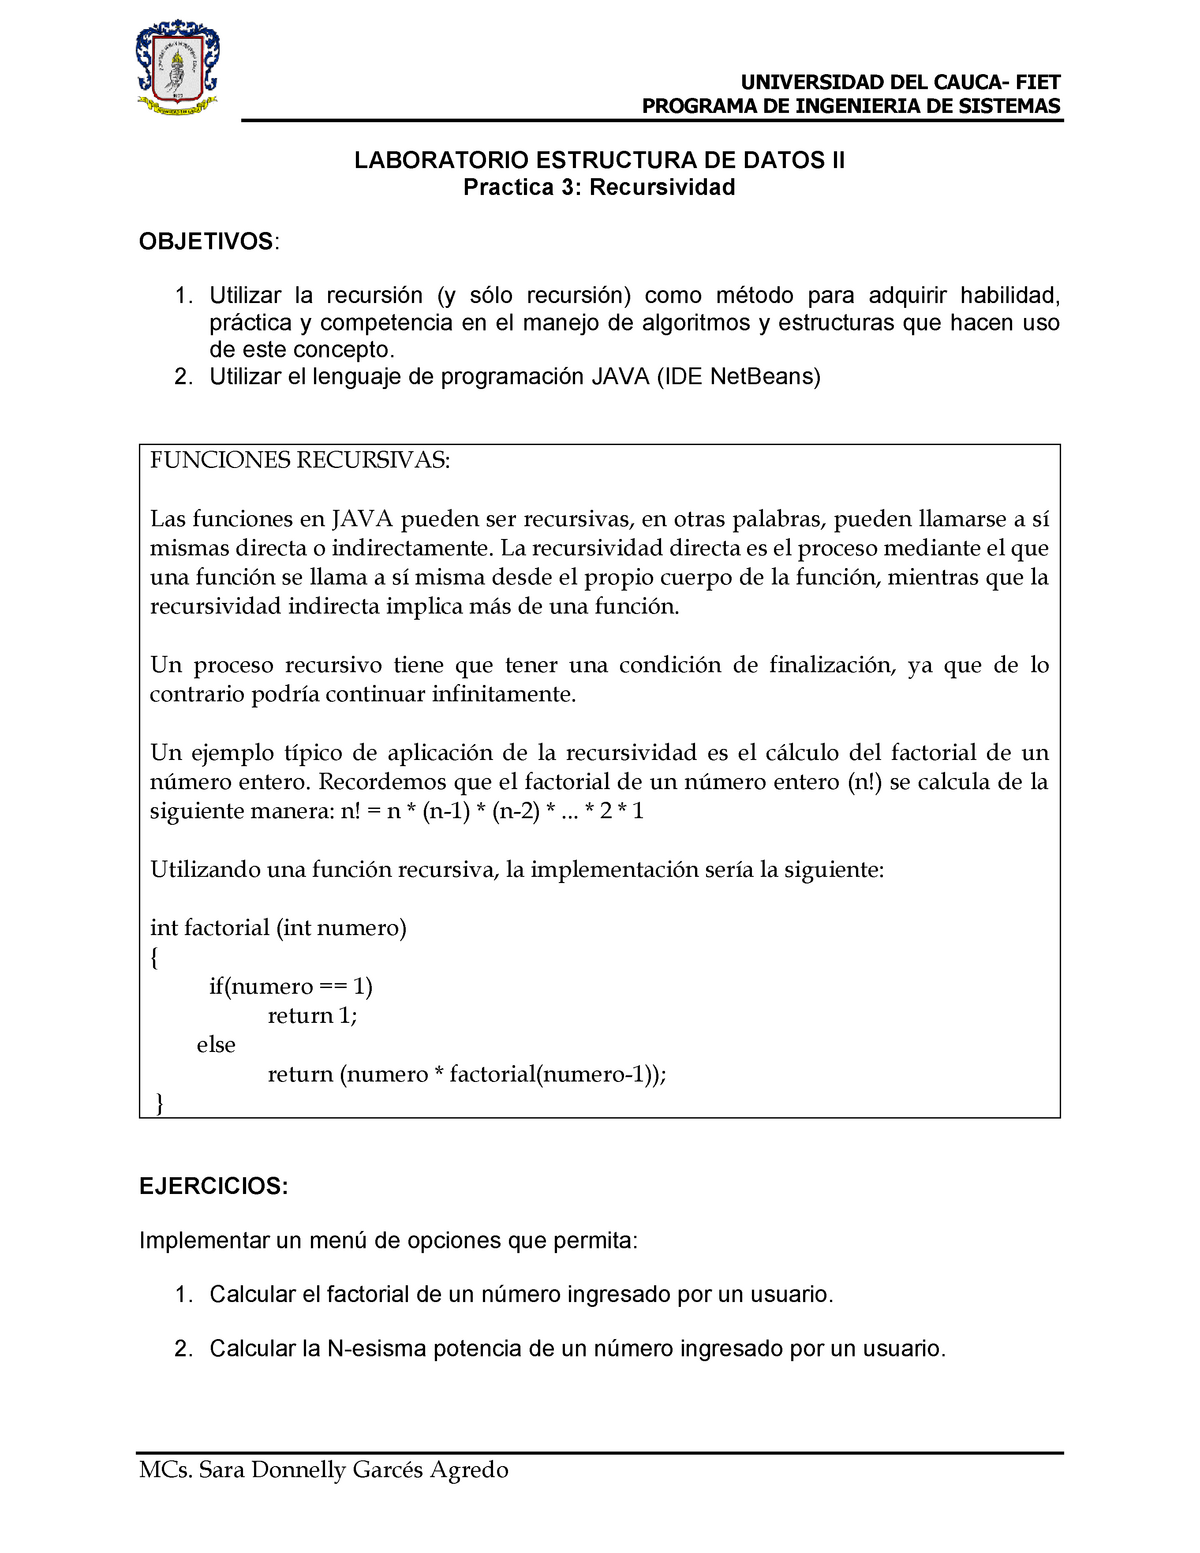 Practica 3 Recursividad Estructura De Datos 2 Sis401 Studocu